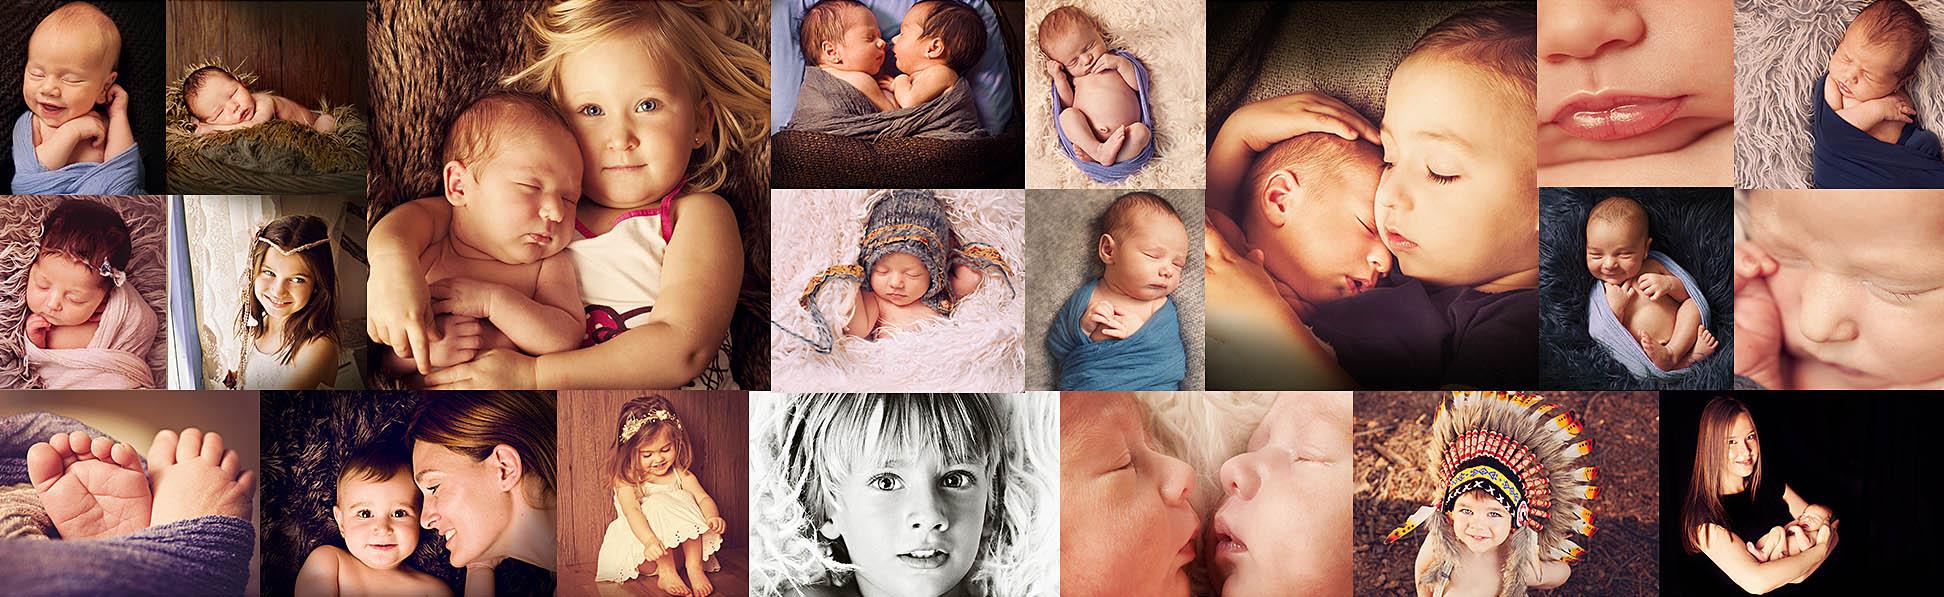 fotos de bebes recien nacidos fotos bebes recien nacidos fotos recien nacidos fotos de recien nacidos fotografos barcelona fotografia creativa, fotos de bebes recien nacidos